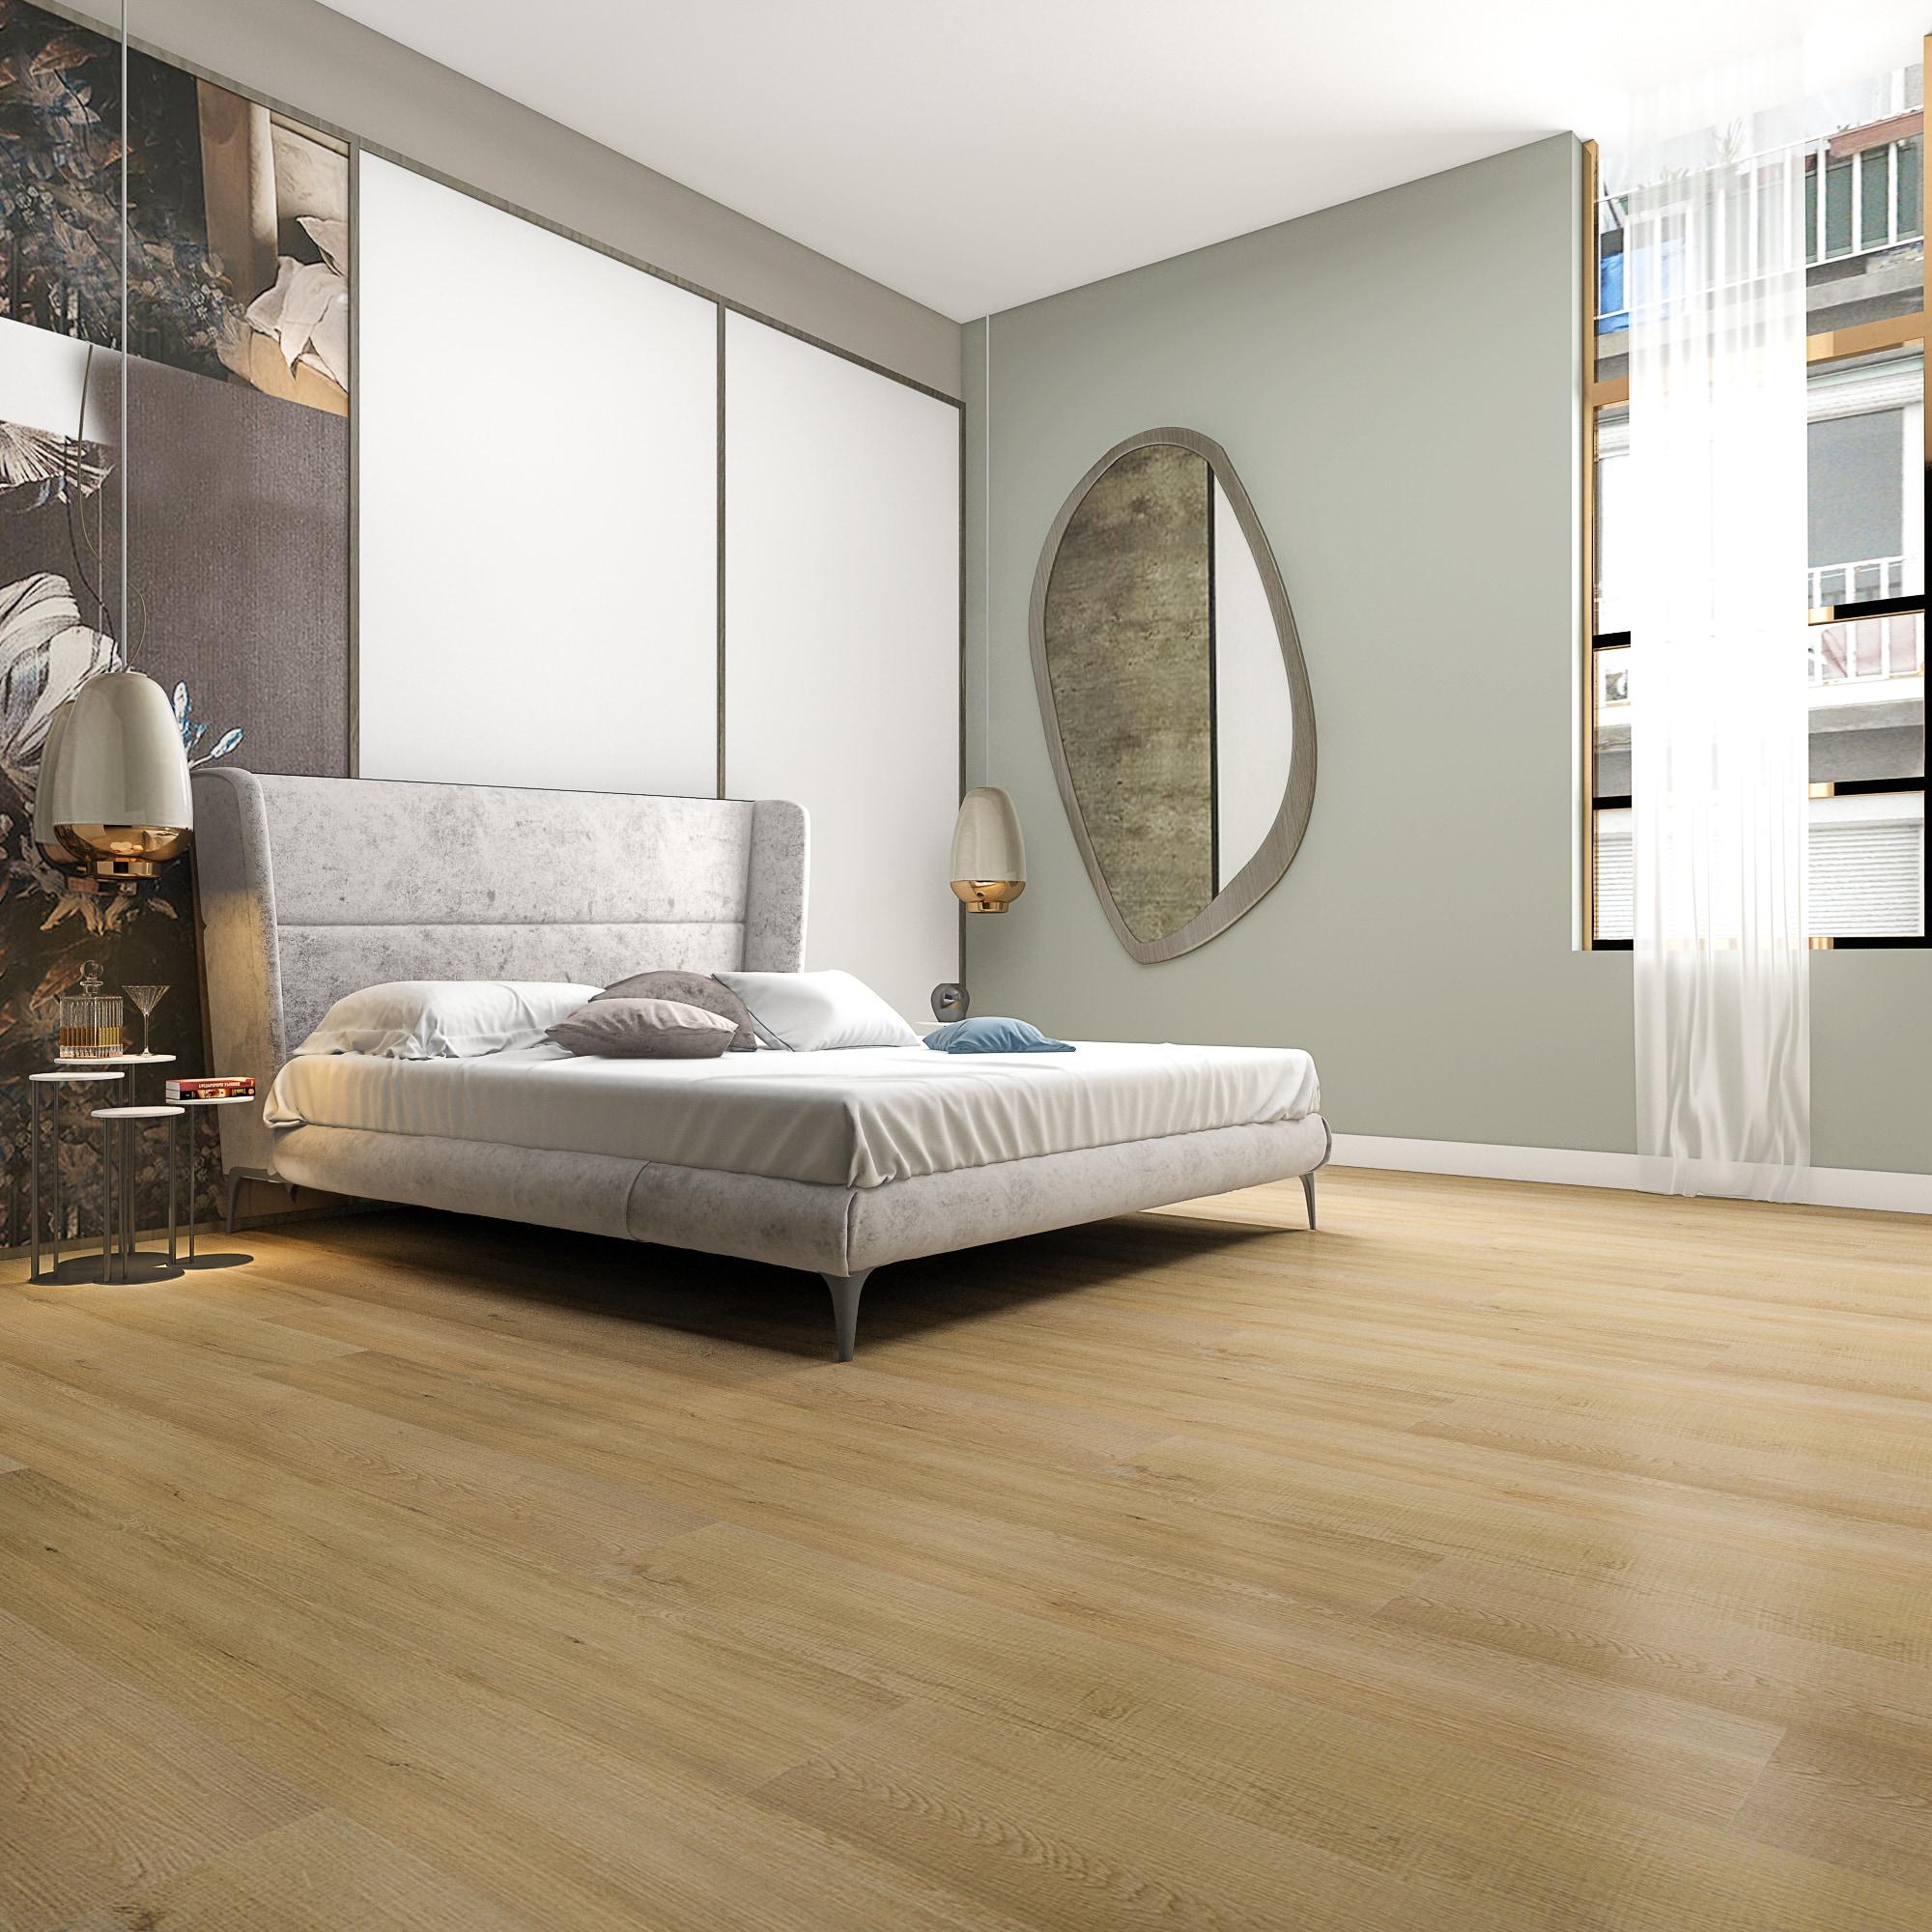 Artisan Copper / 7mm / SPC / Click Lock Vinyl Planks - 7mm SPC Click Lock - XL Omnia Collection 0